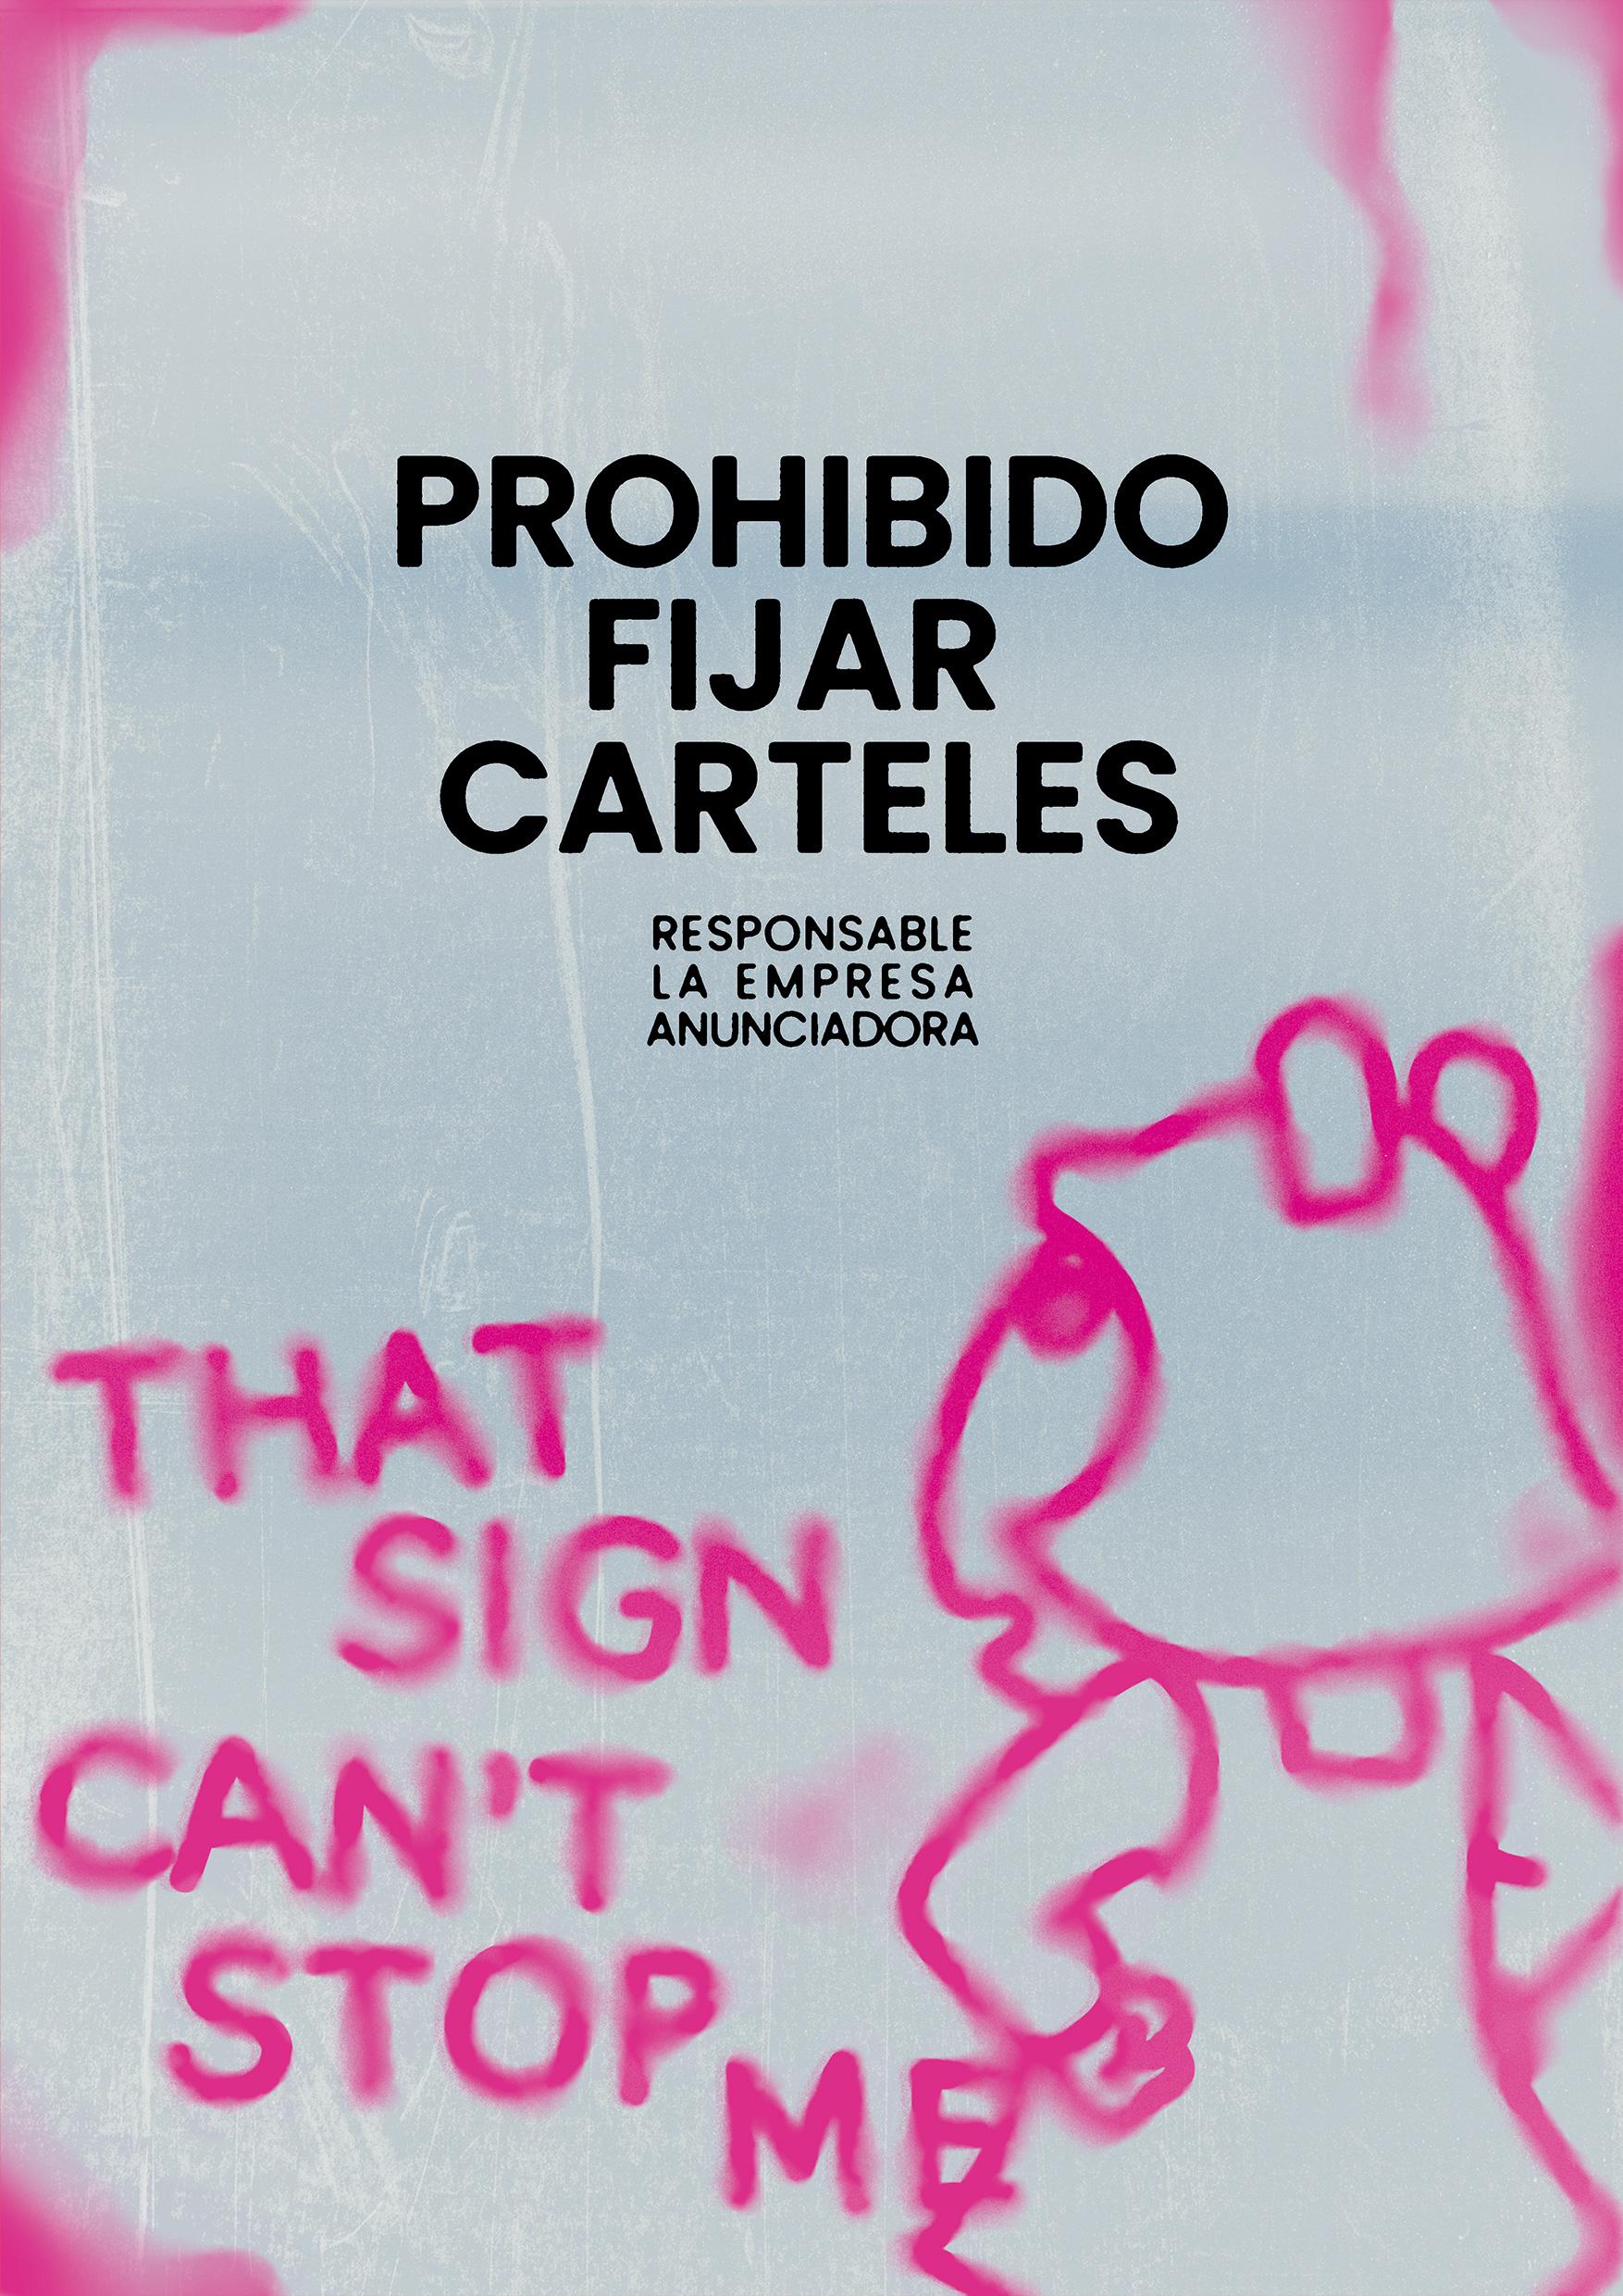 Prohíbido Fijar carteles